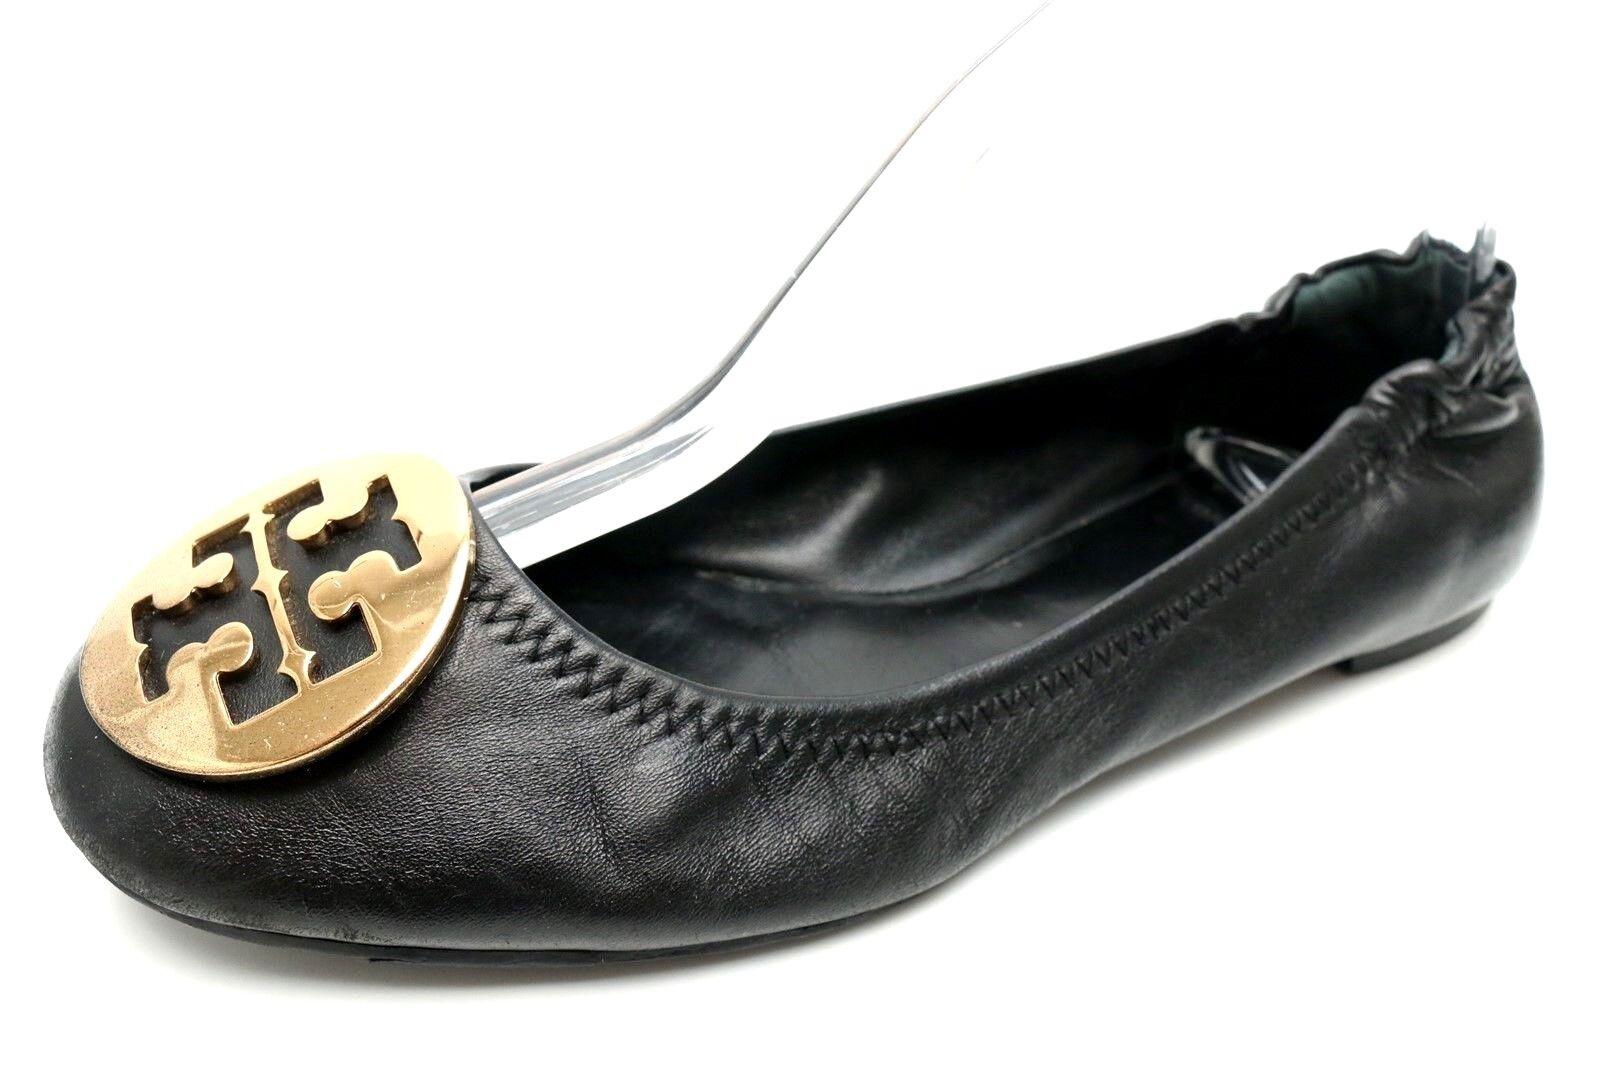 cad57518bd3f Details about Womens TORY BURCH REVA black leather ballet flats shoes  casual sz. 7 M